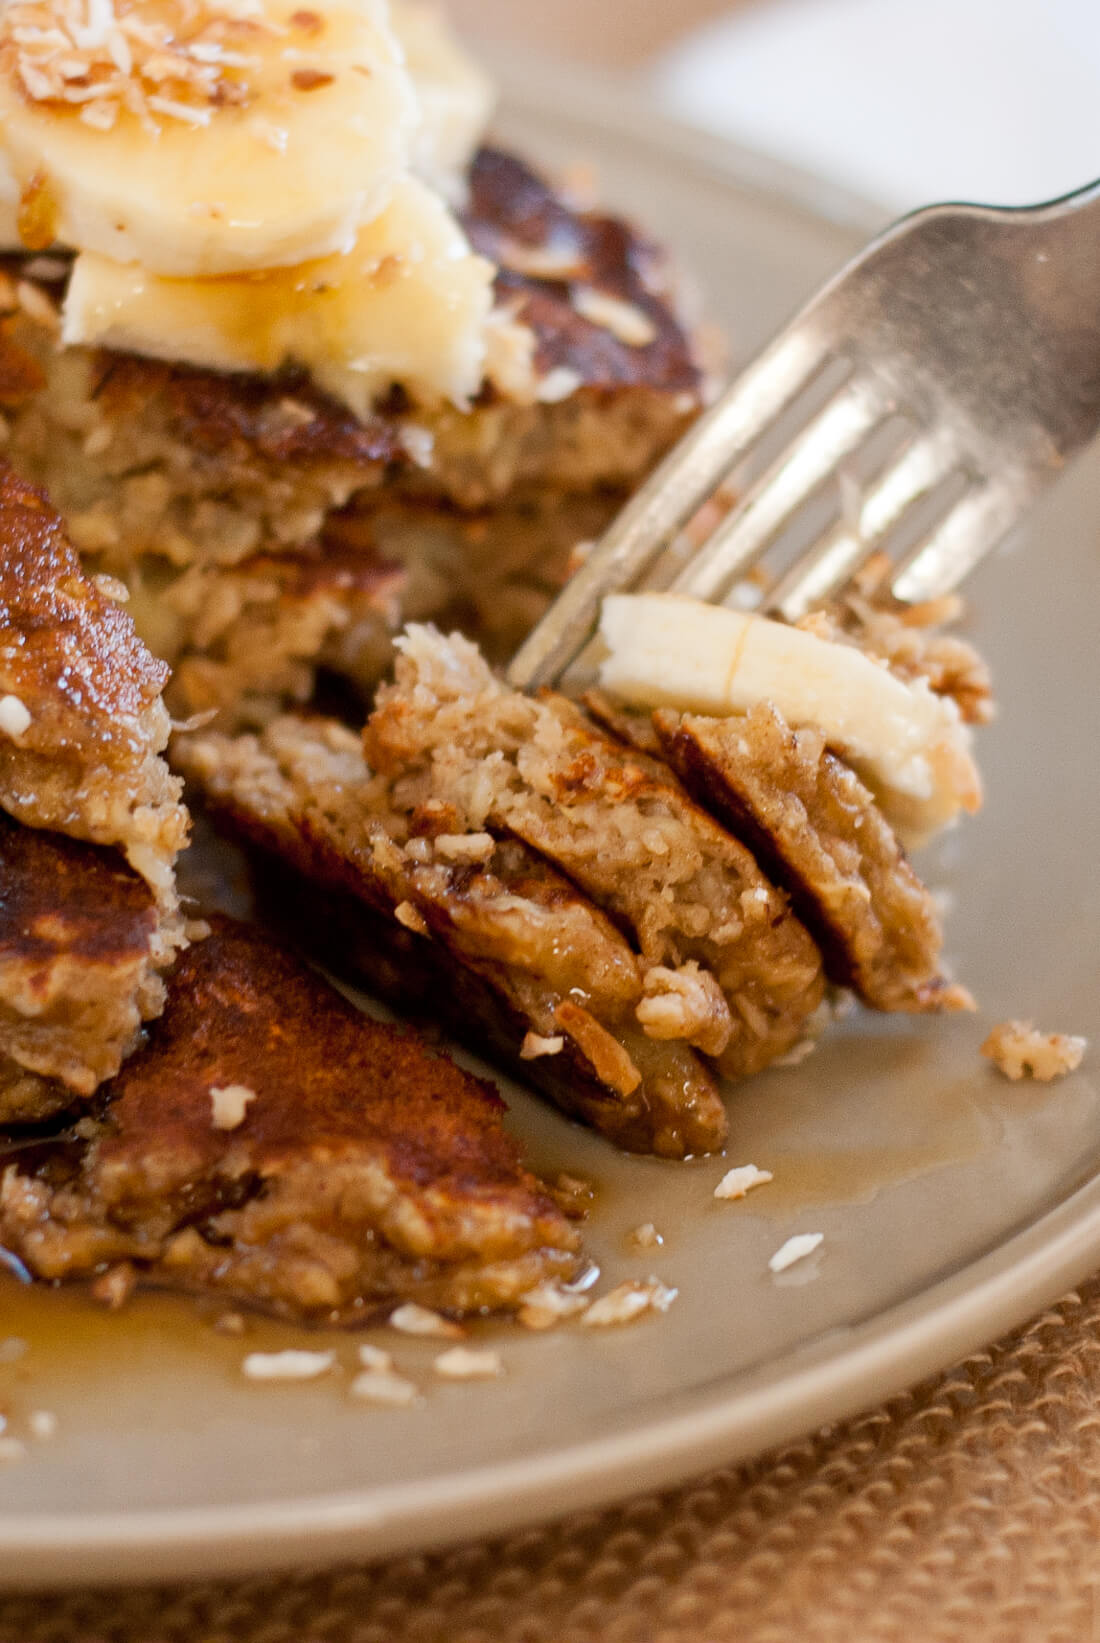 whole grain, gluten free banana oat pancakes